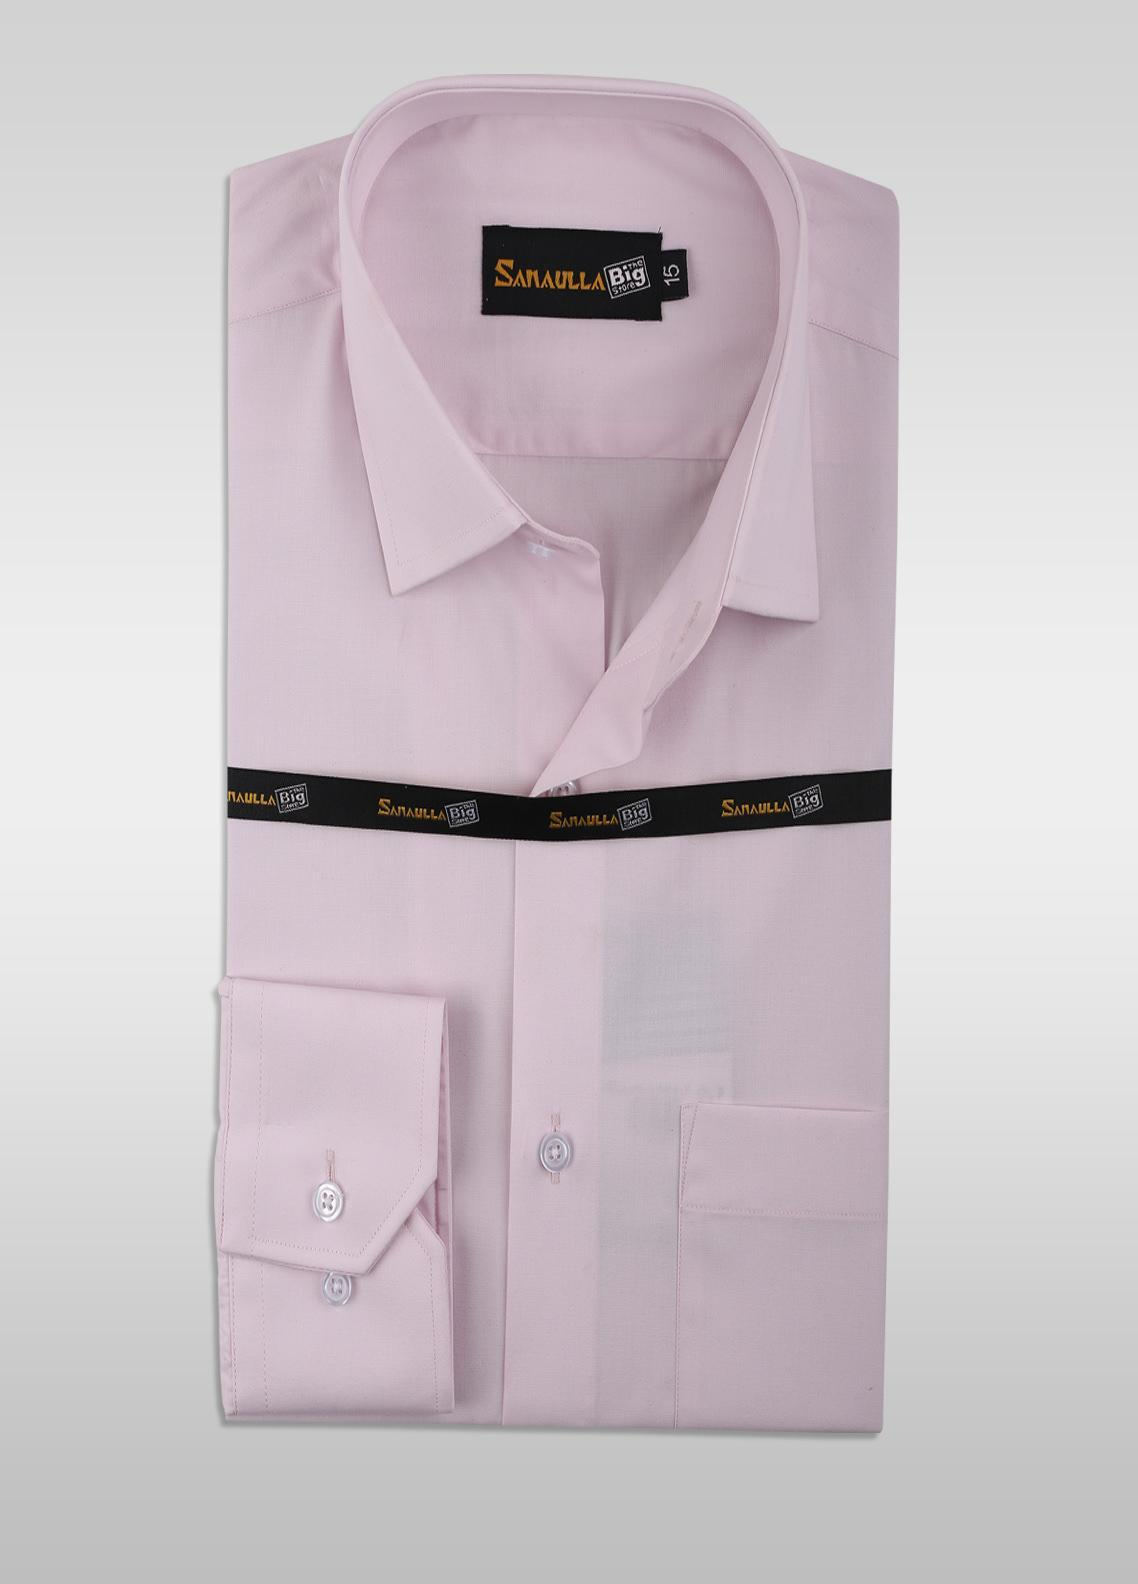 Sanaulla Exclusive Range Cotton Formal Shirts for Men -  SU21GR 09-L-Pink